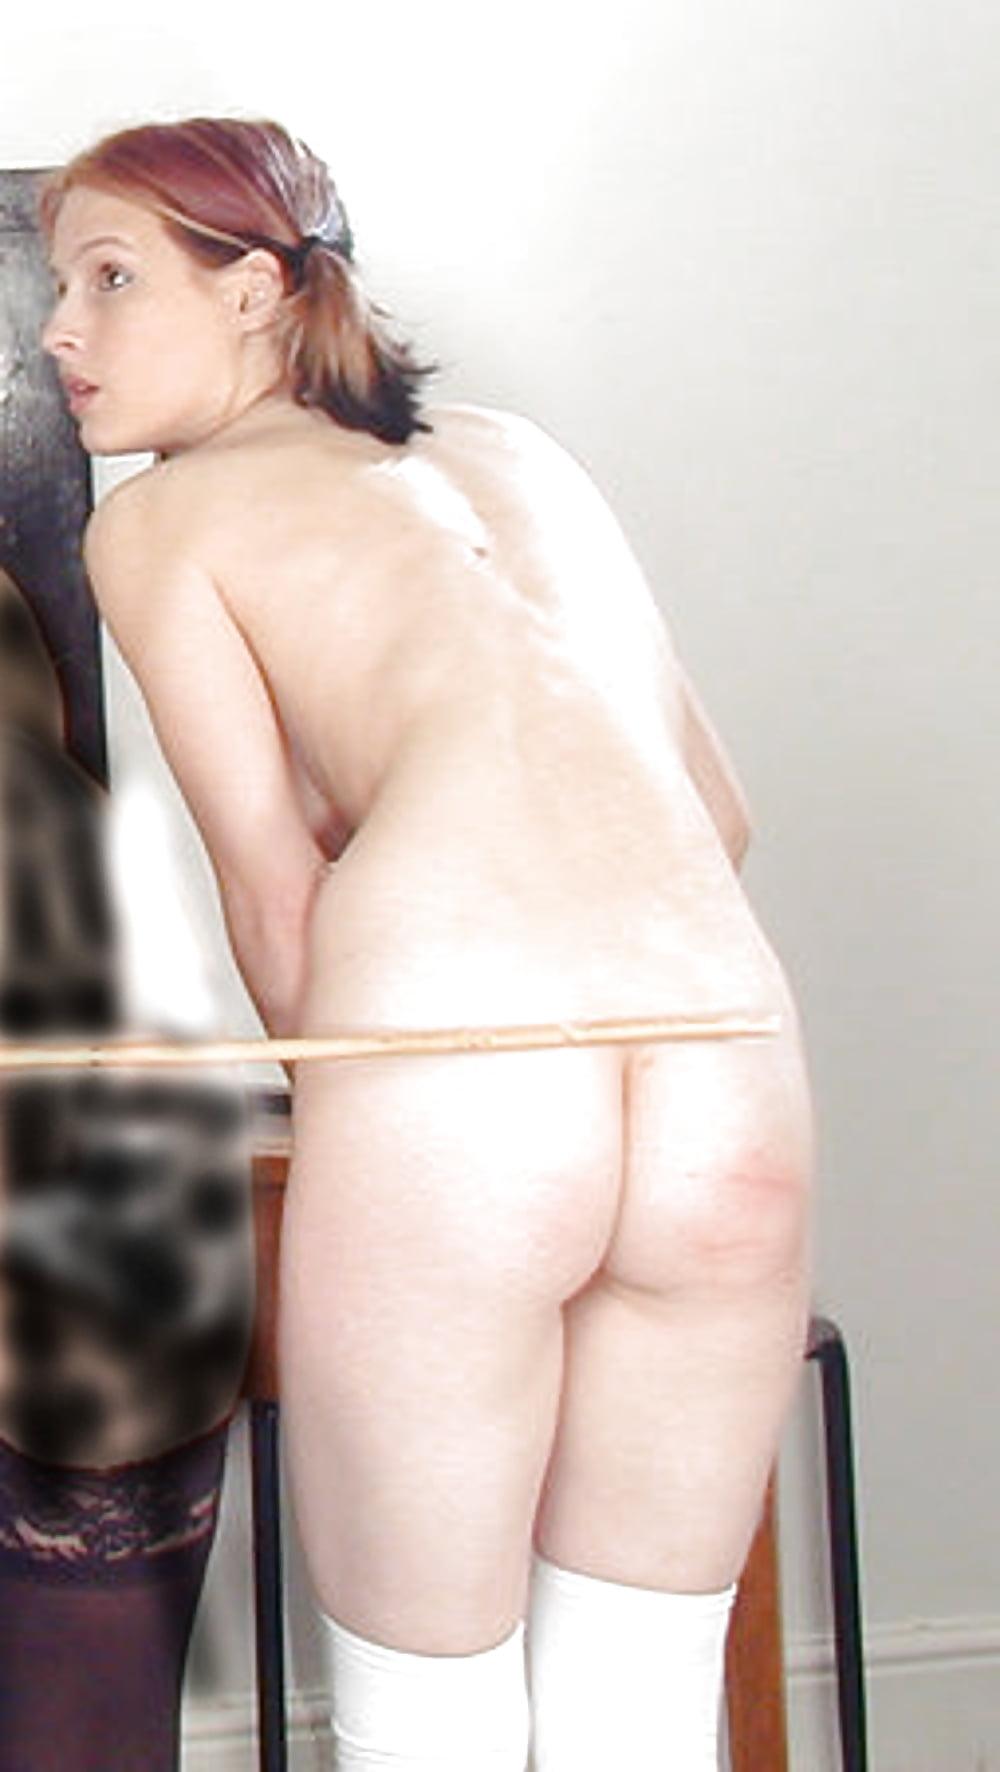 Nude latina female frontal